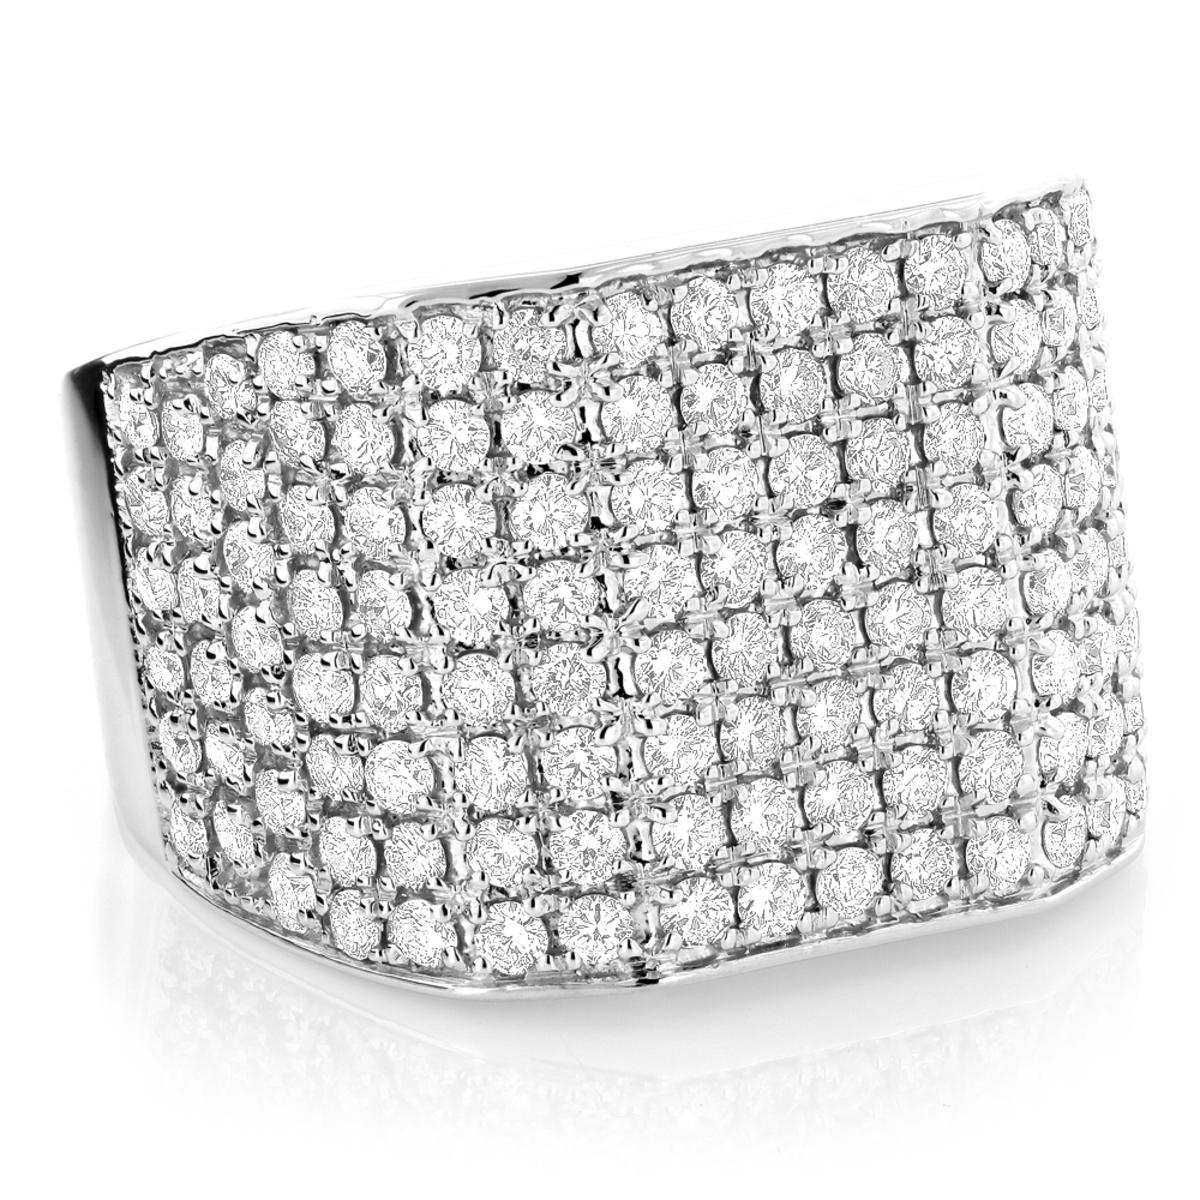 Mens Diamond Rings Collection 4.5ct Luxurman Custom Made Ring 14k Gold